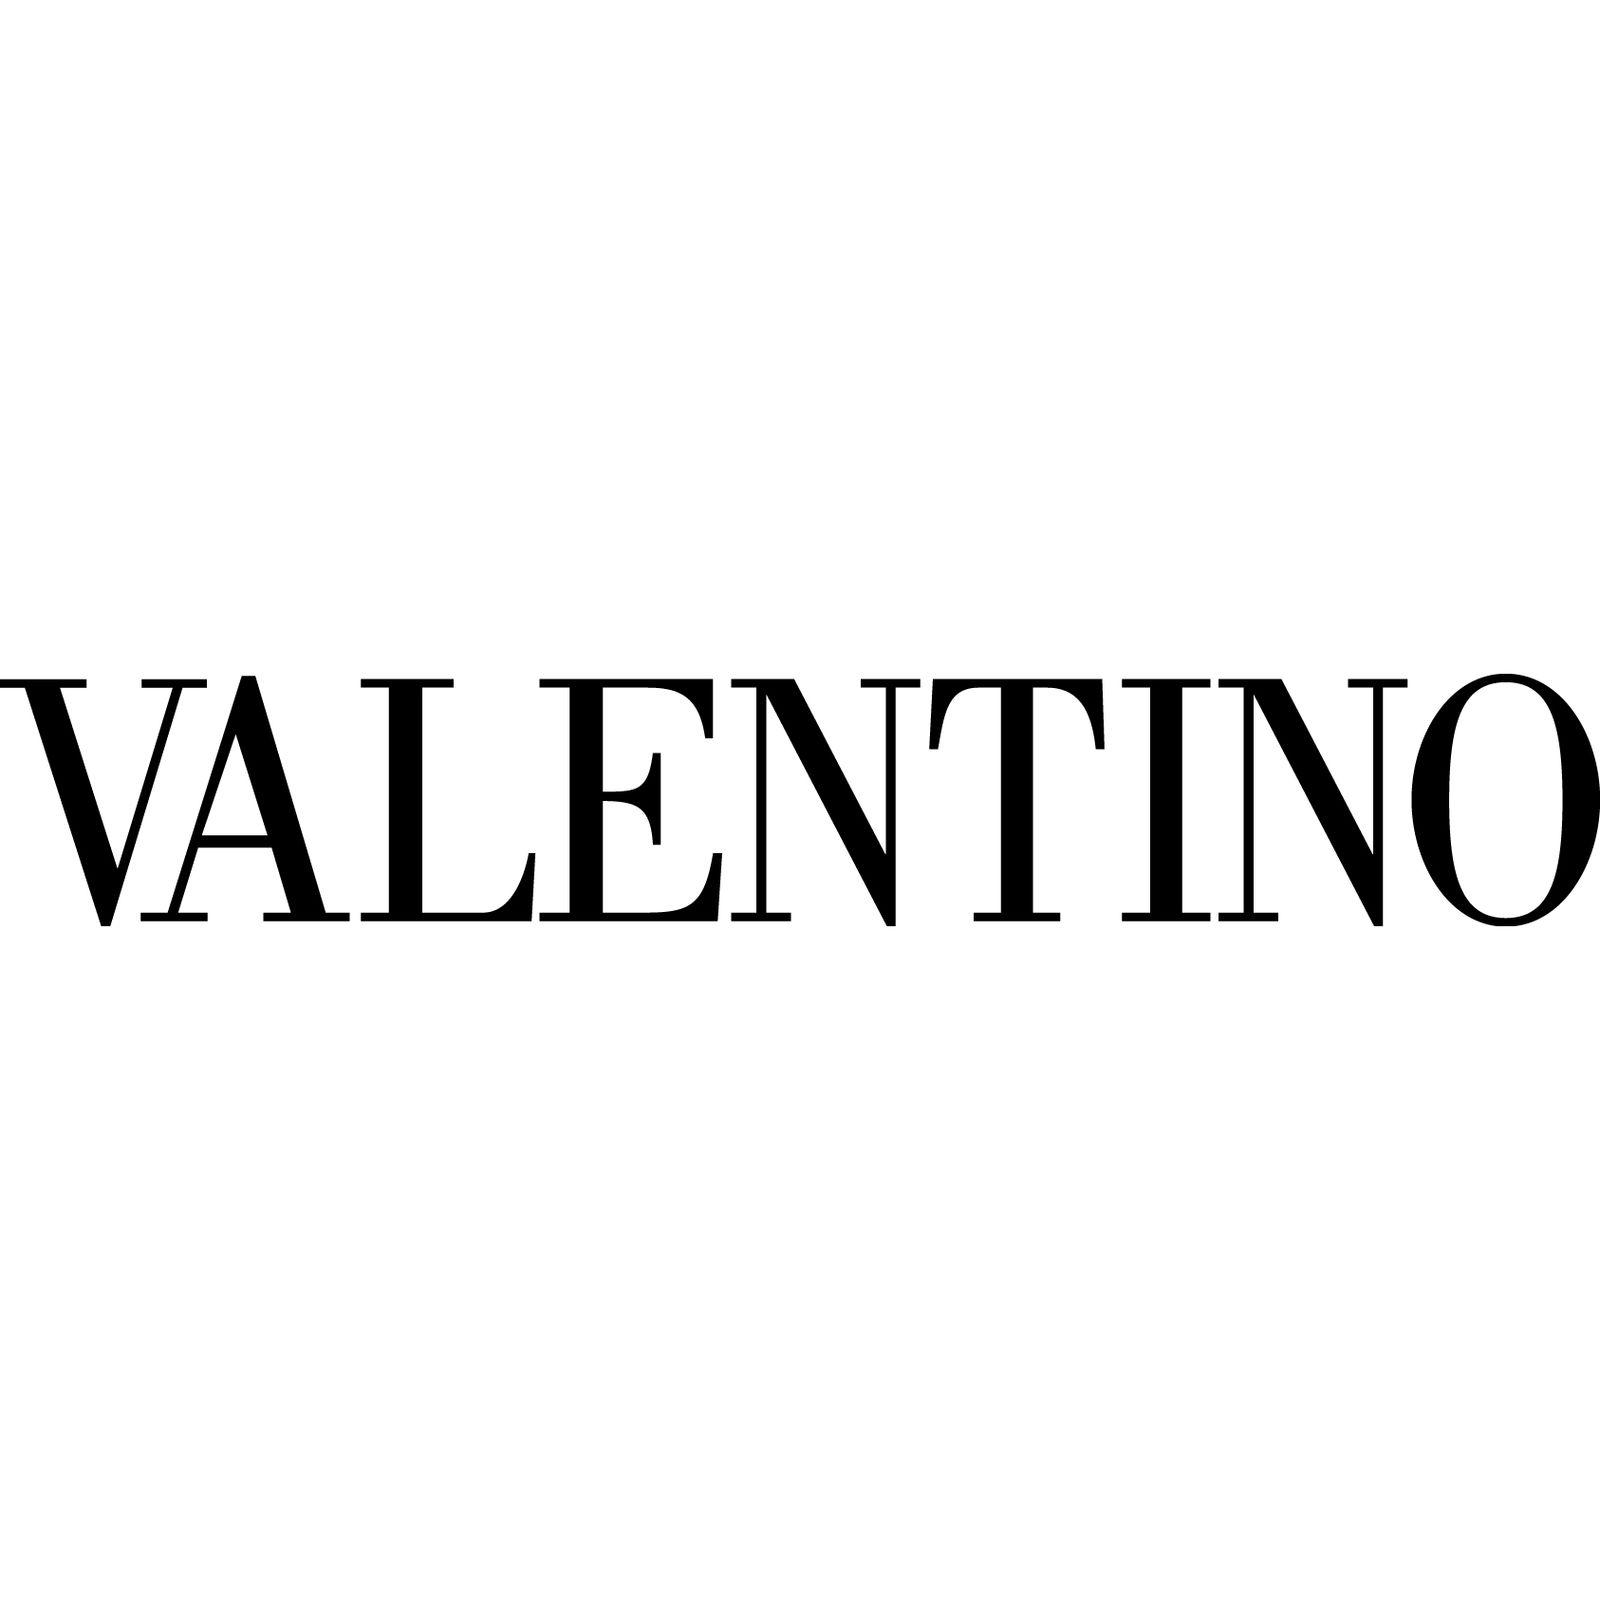 VALENTINO Eyewear (Image 1)